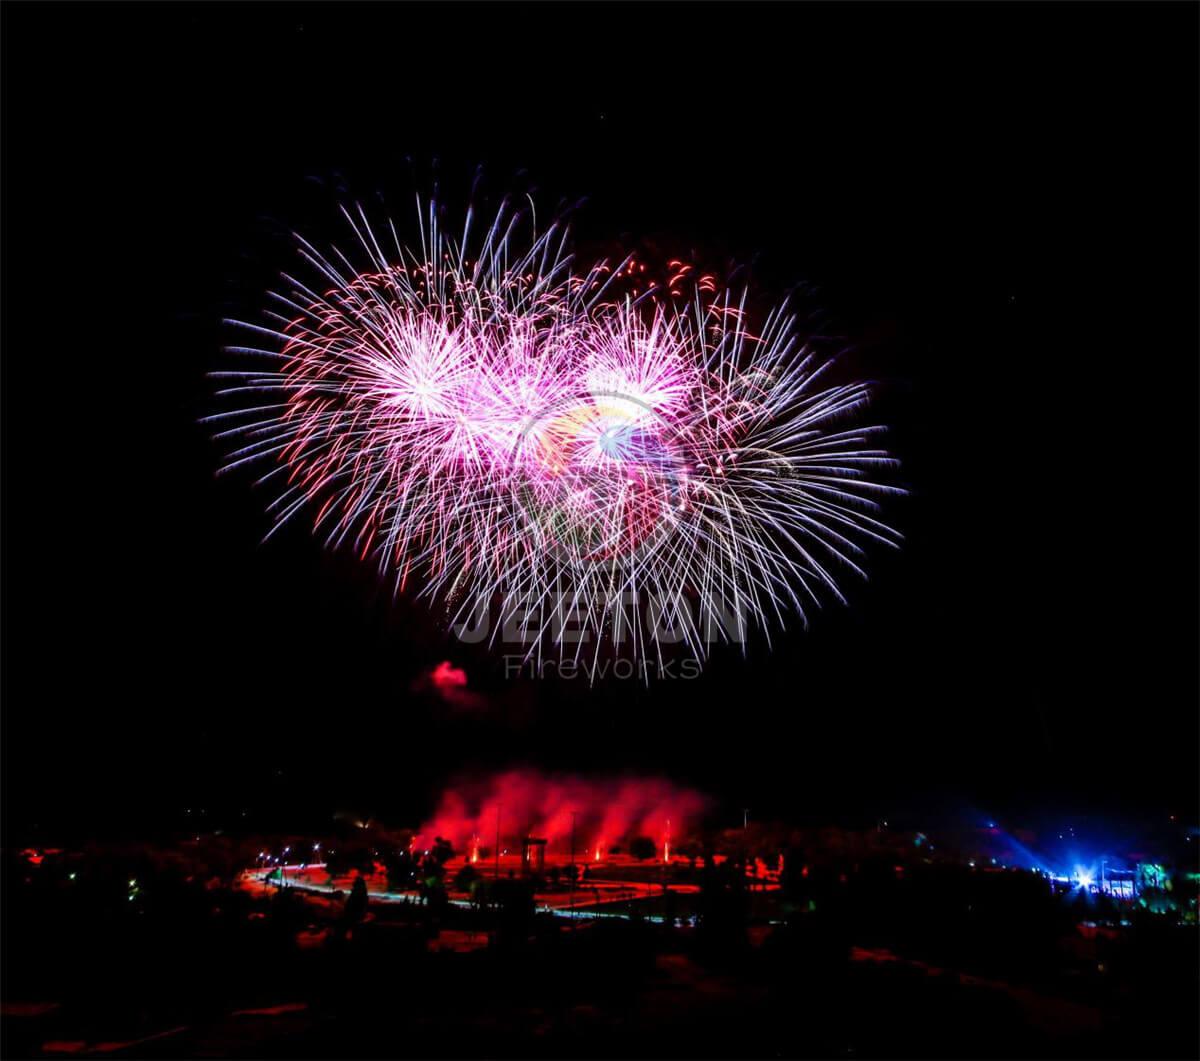 The 28th Anniversary Celebration Fireworks Show of Uzbekistan